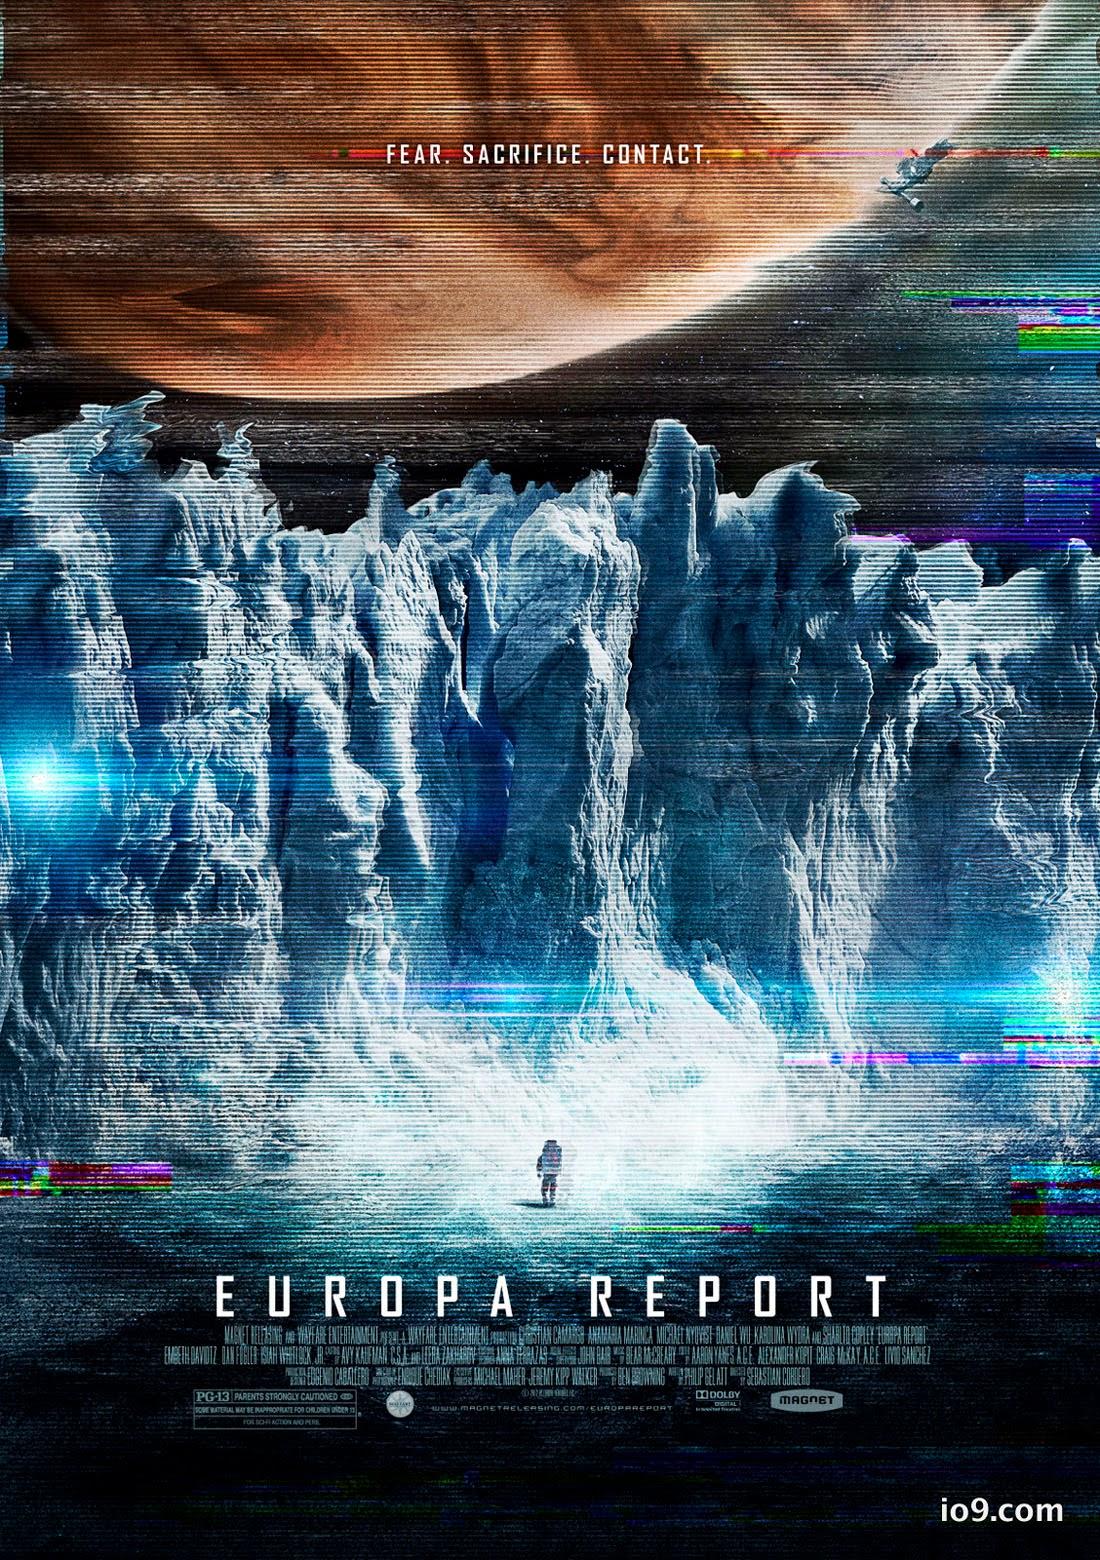 Truy Tìm Sự Sống - Europa Repor